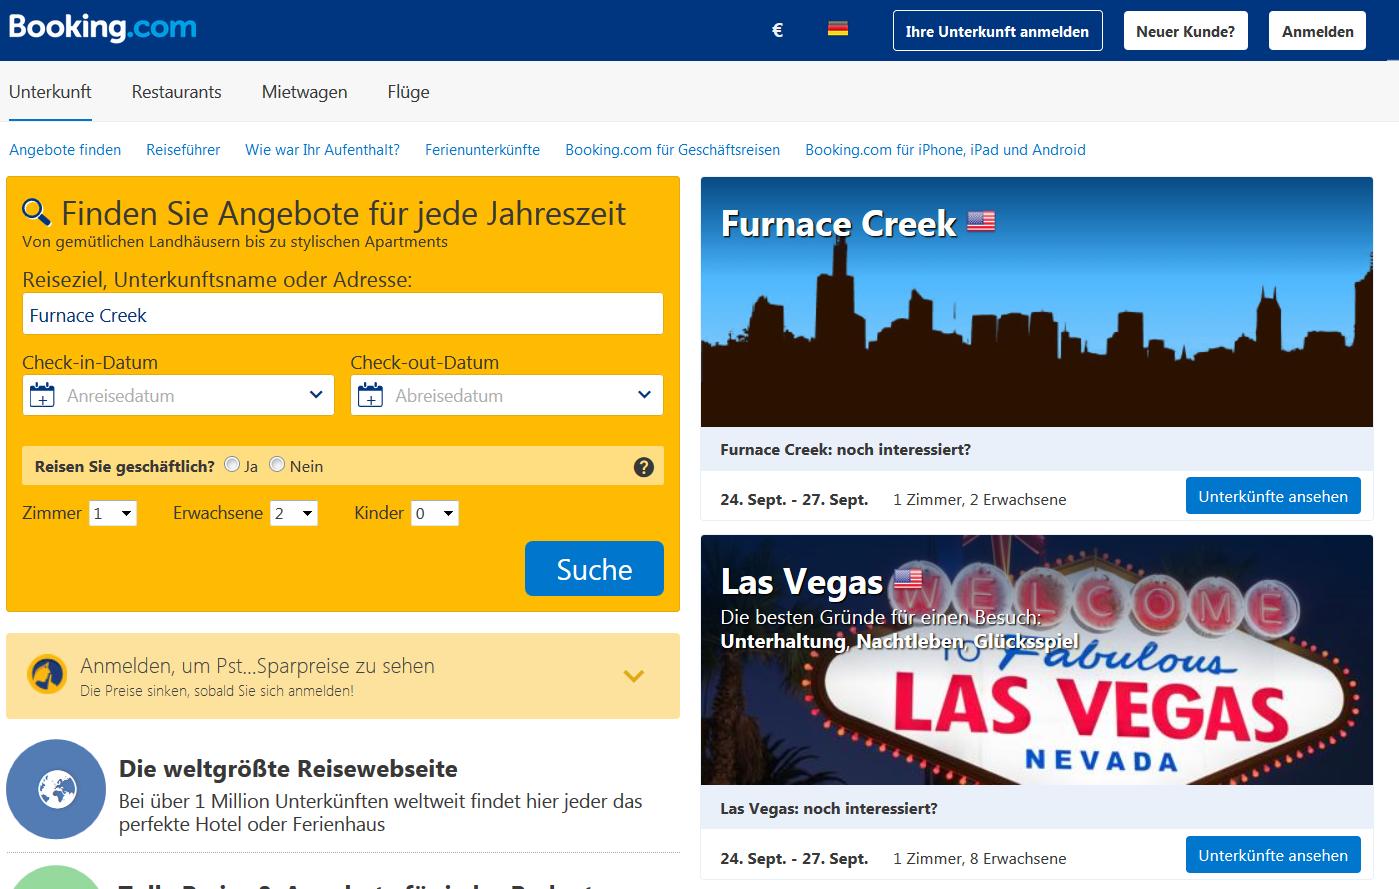 screenshot-booking-com.png